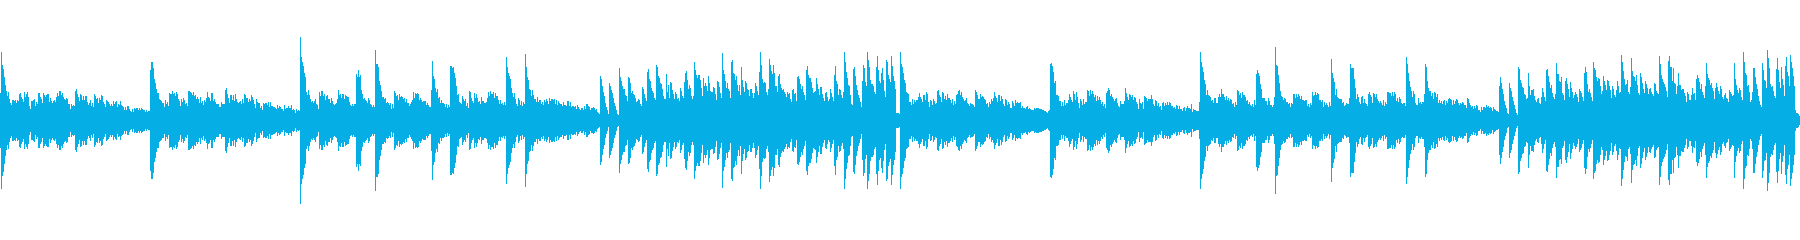 8bitクラシック-水族館-(ループ)の再生済みの波形